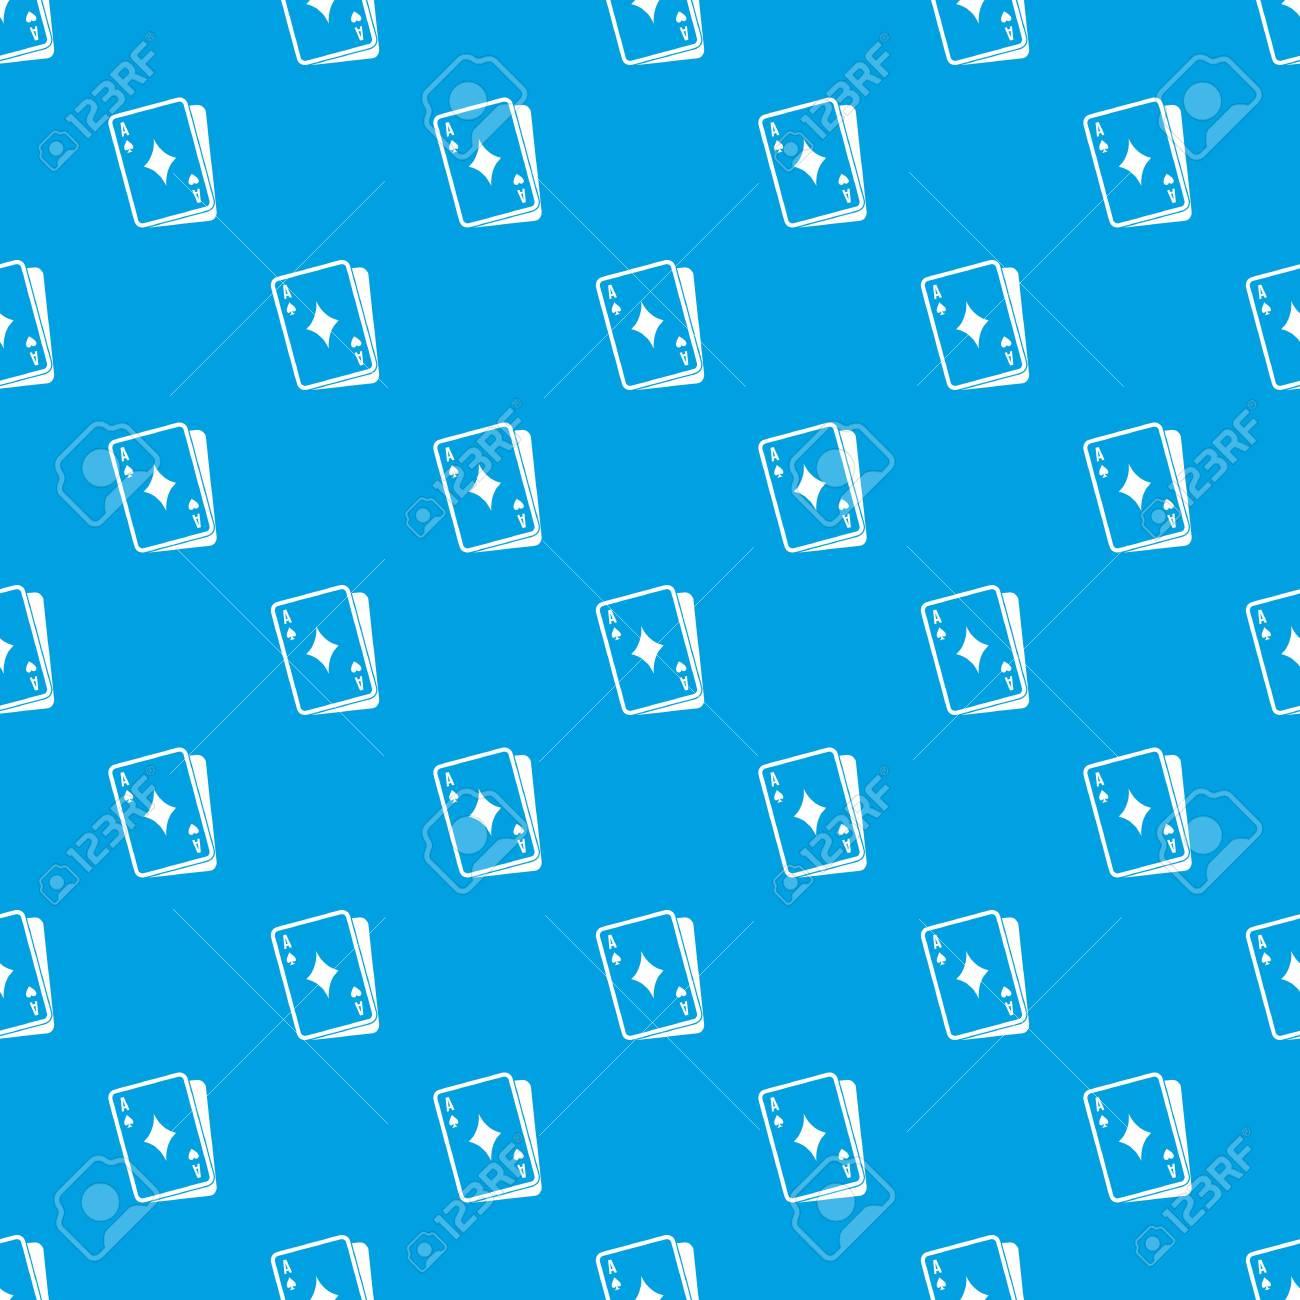 Carte Bleue Transparente.Modele De Carte A Jouer Bleu Transparente Clip Art Libres De Droits